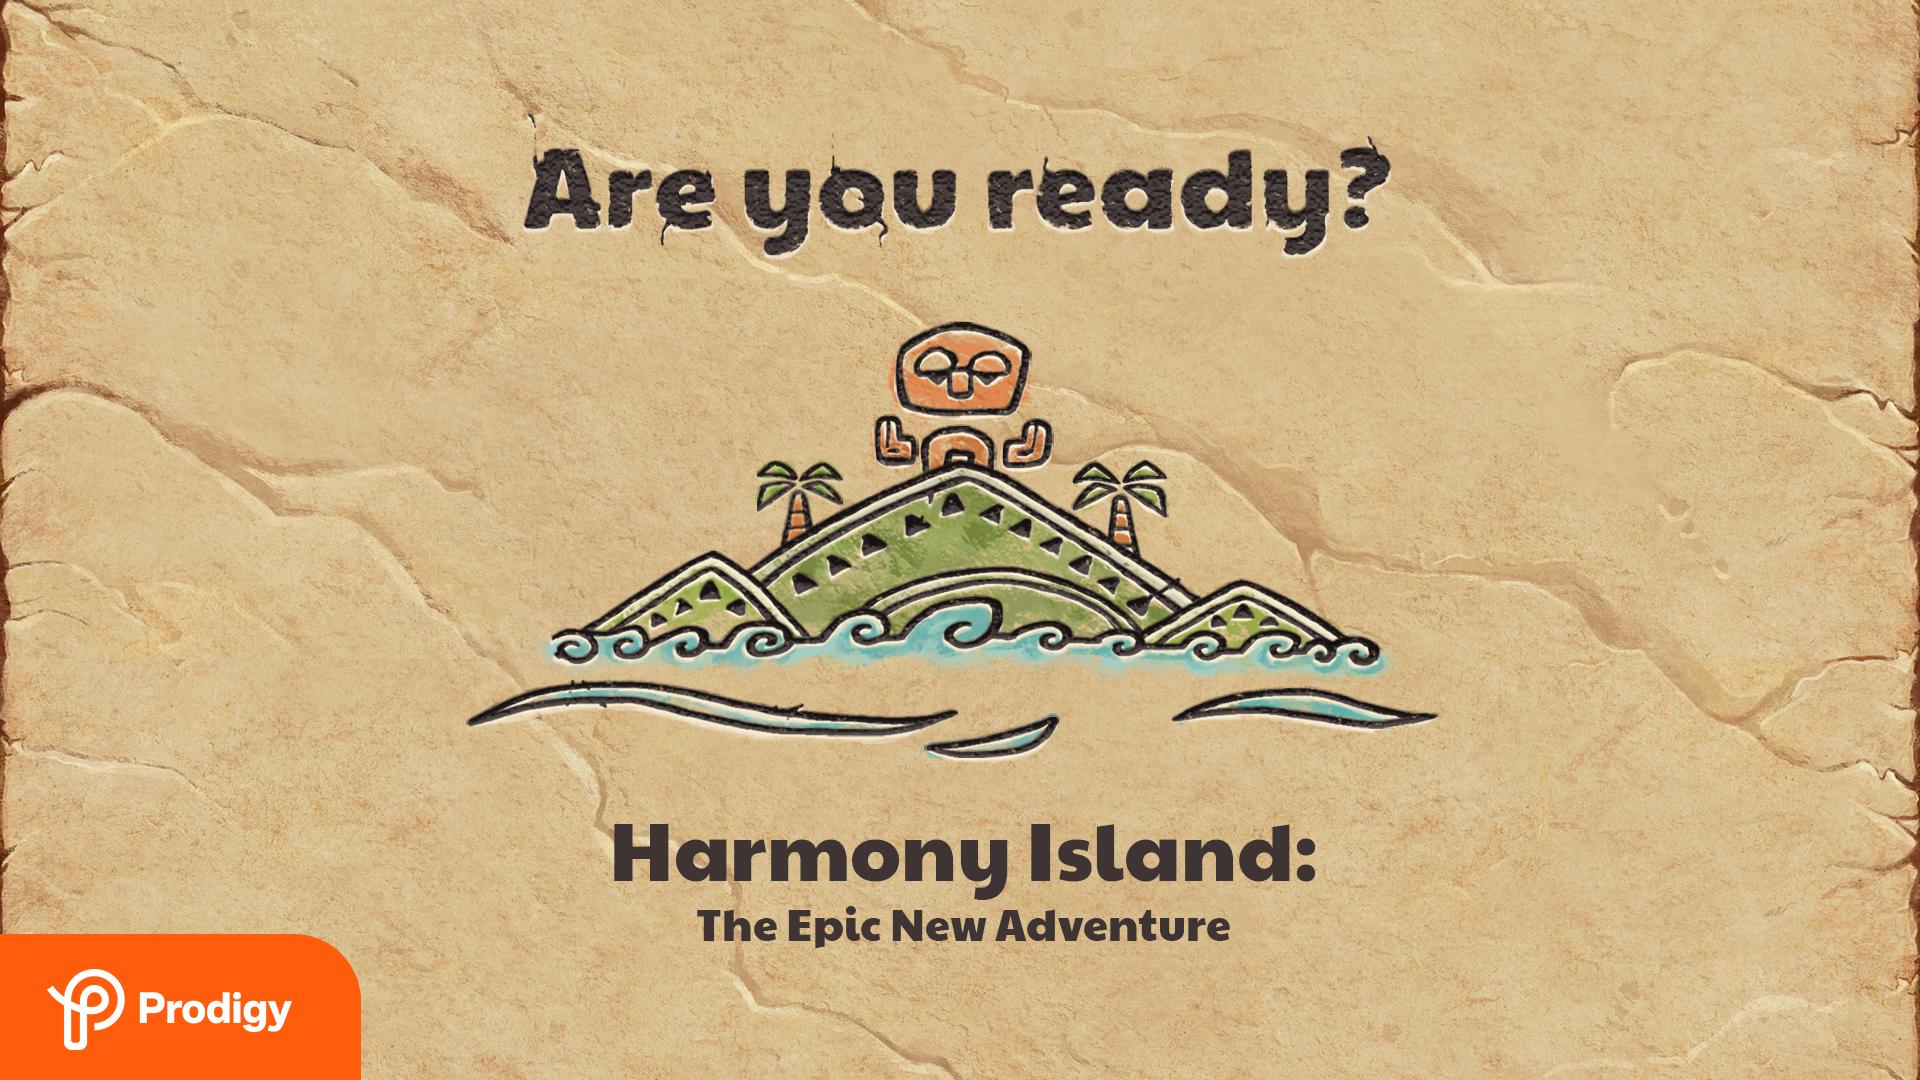 Harmony Island Zoom background: the island